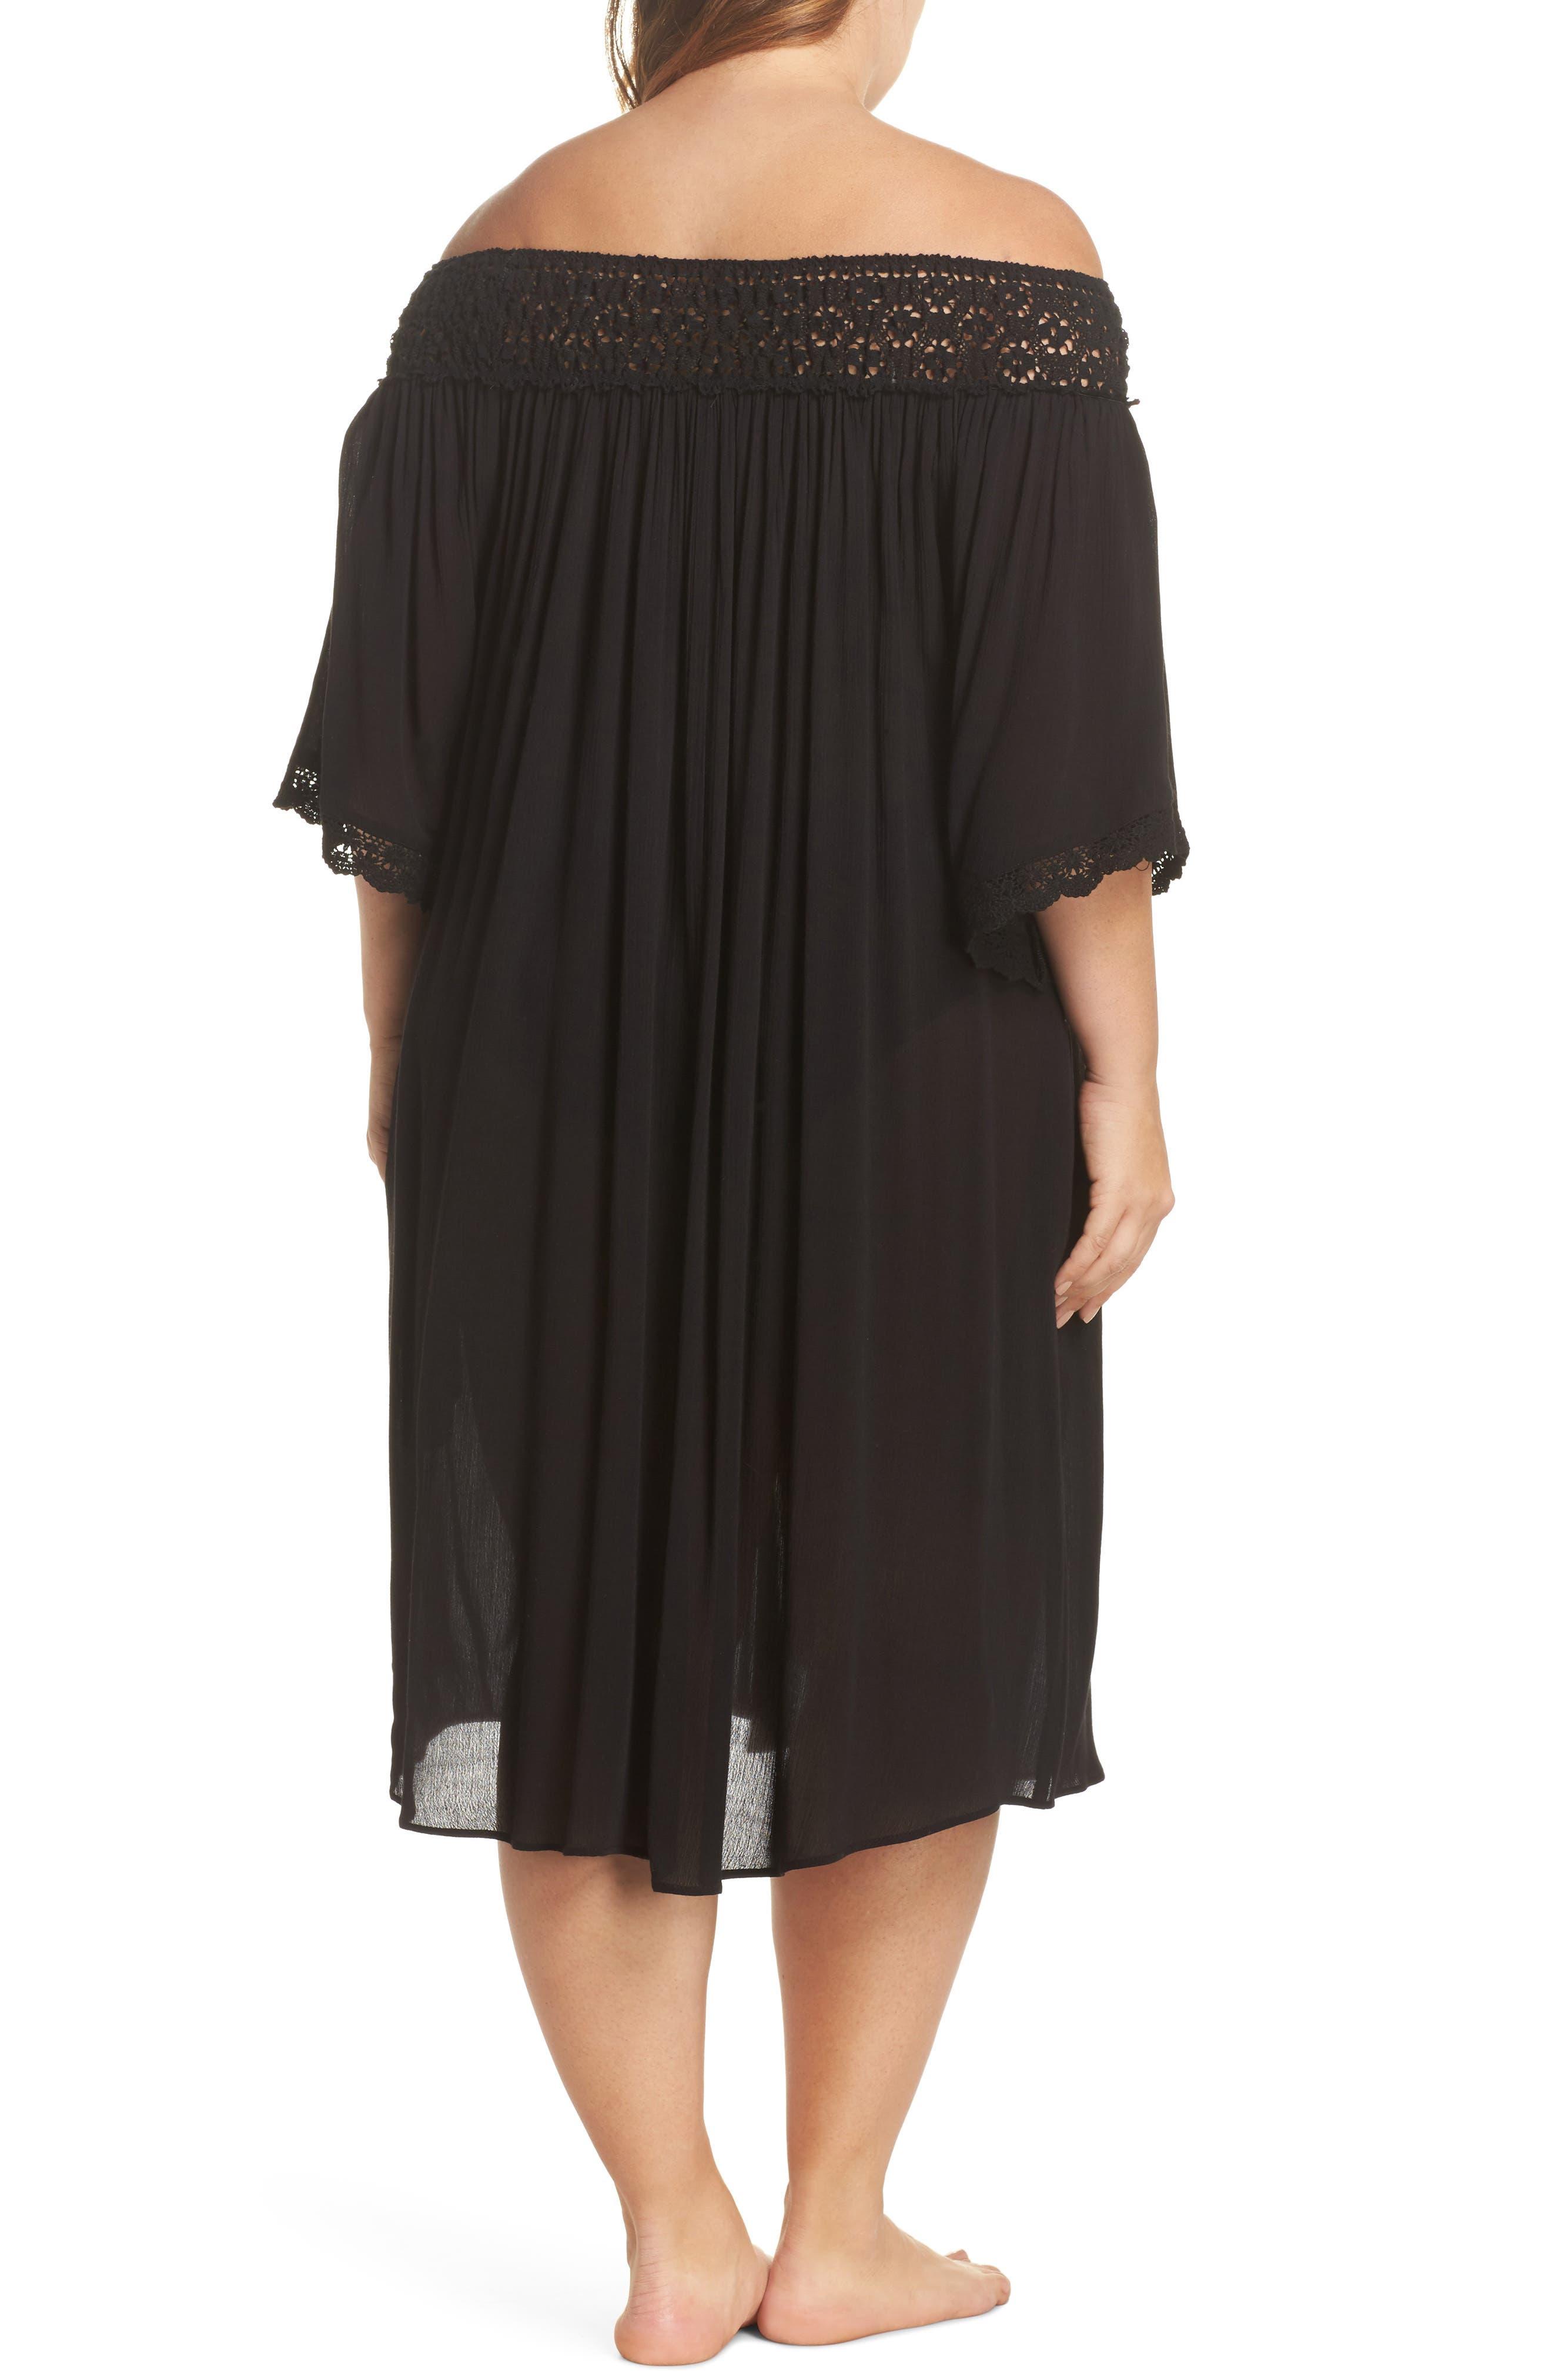 Rimini Crochet Cover-Up Dress,                             Alternate thumbnail 2, color,                             001